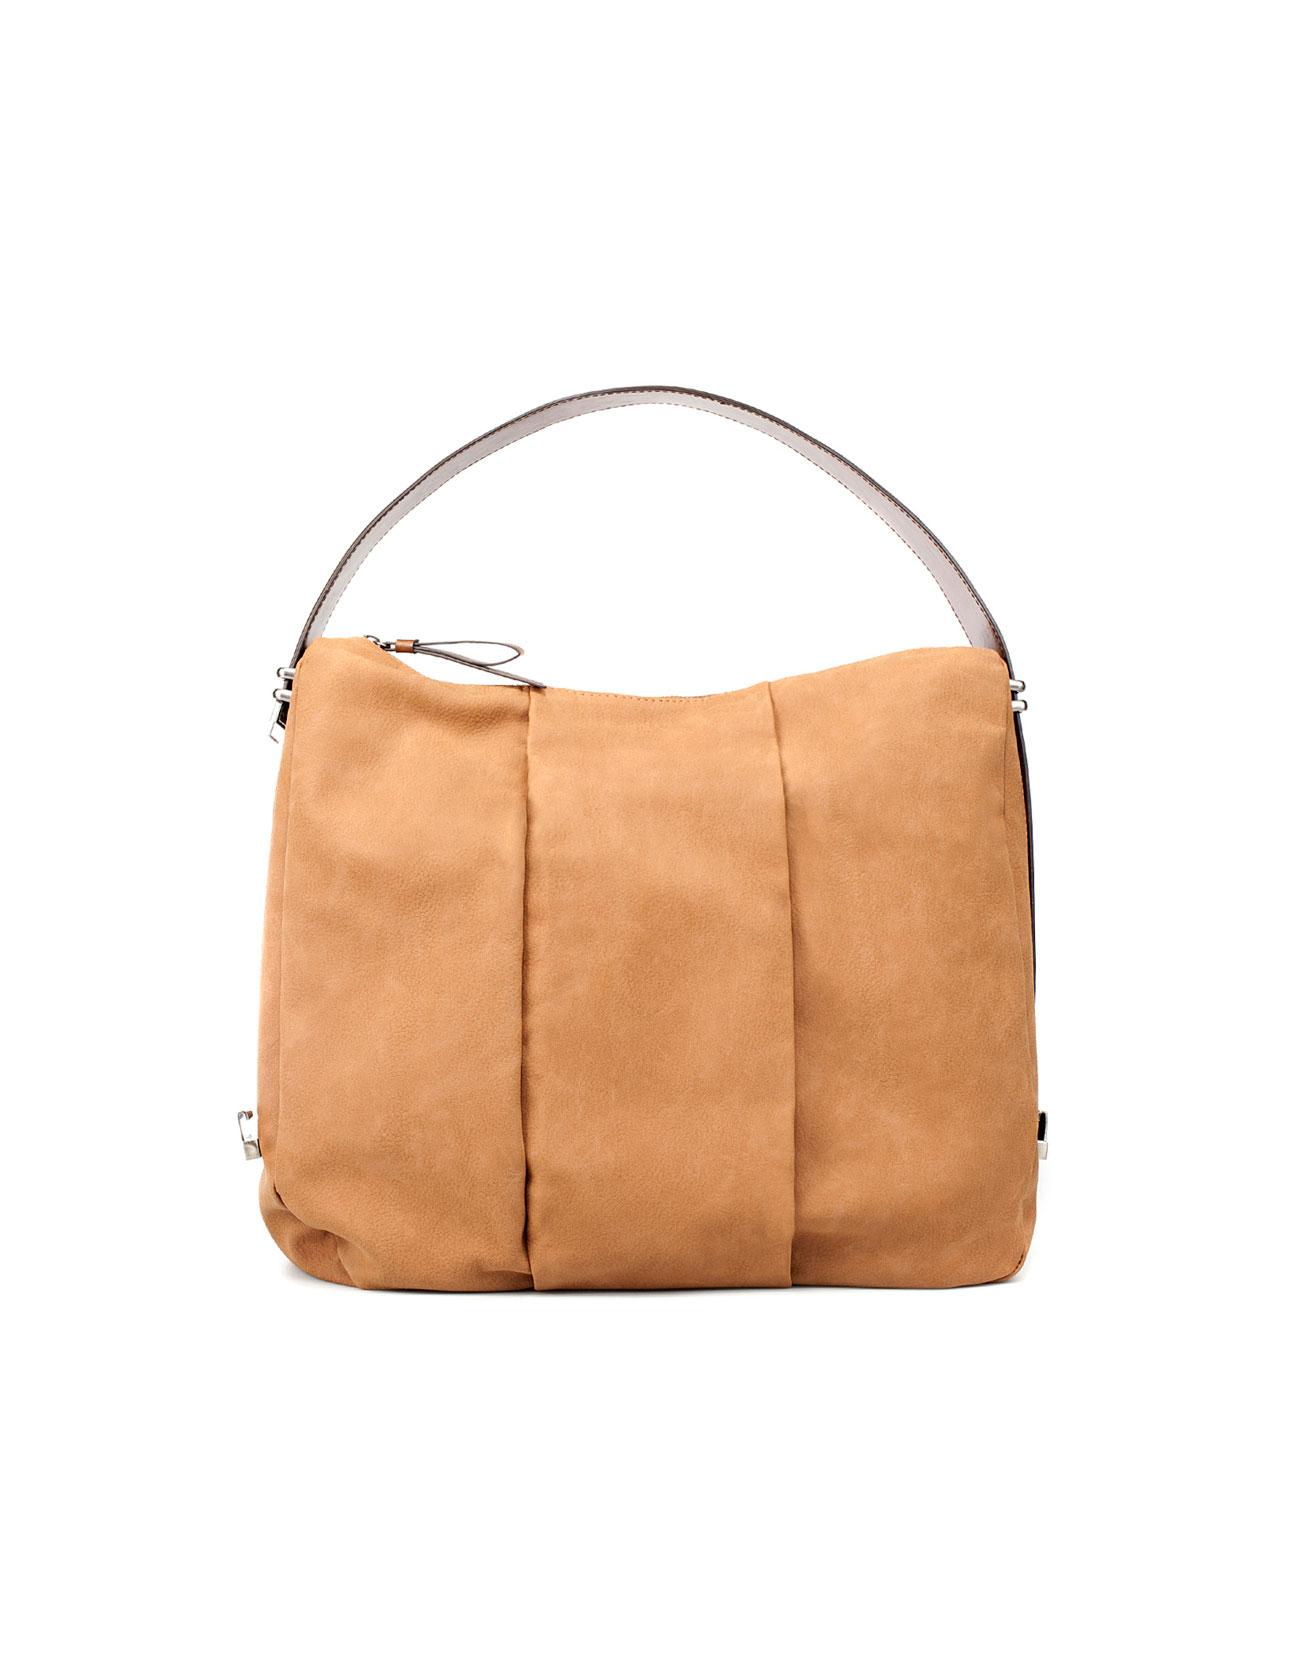 Zara Bucket Bag With Adjustable Handle In Brown Lyst